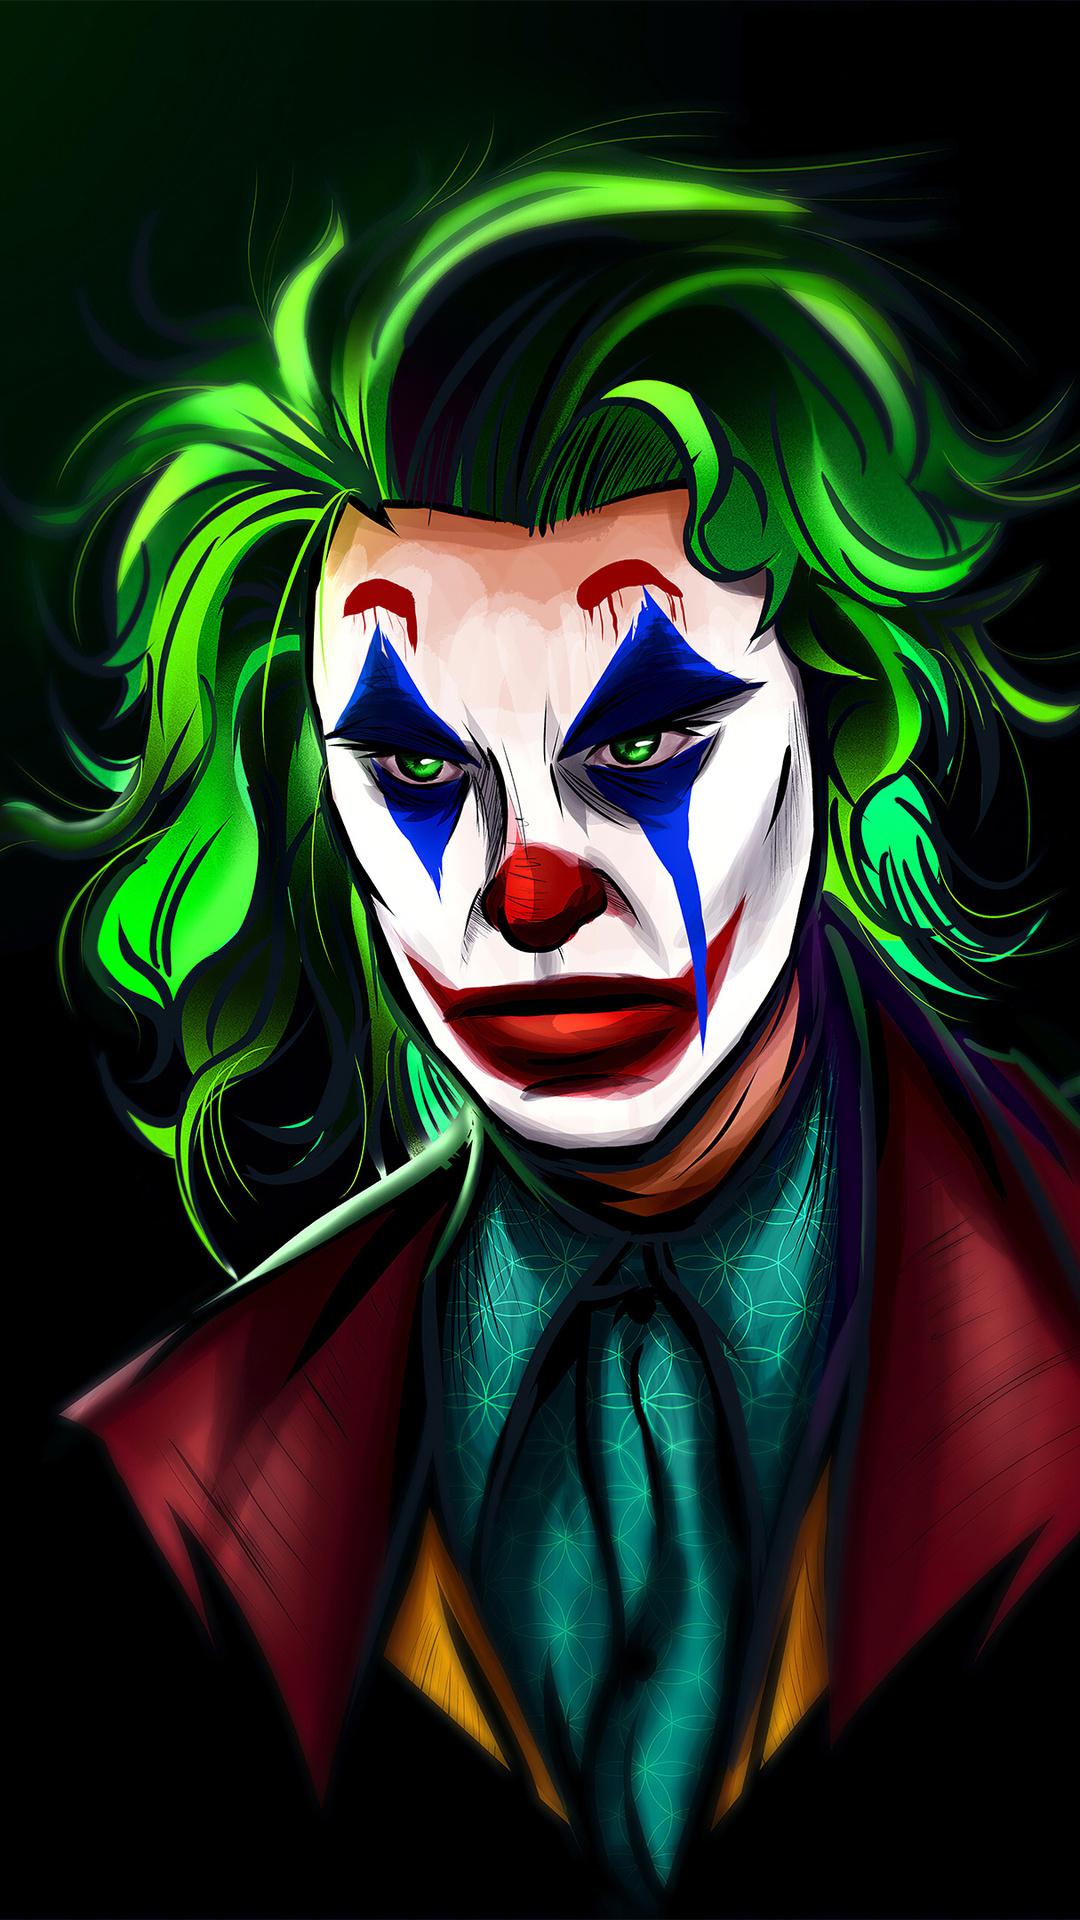 1080x1920 Joker Man 4k Iphone 7,6s,6 Plus, Pixel xl ,One ...